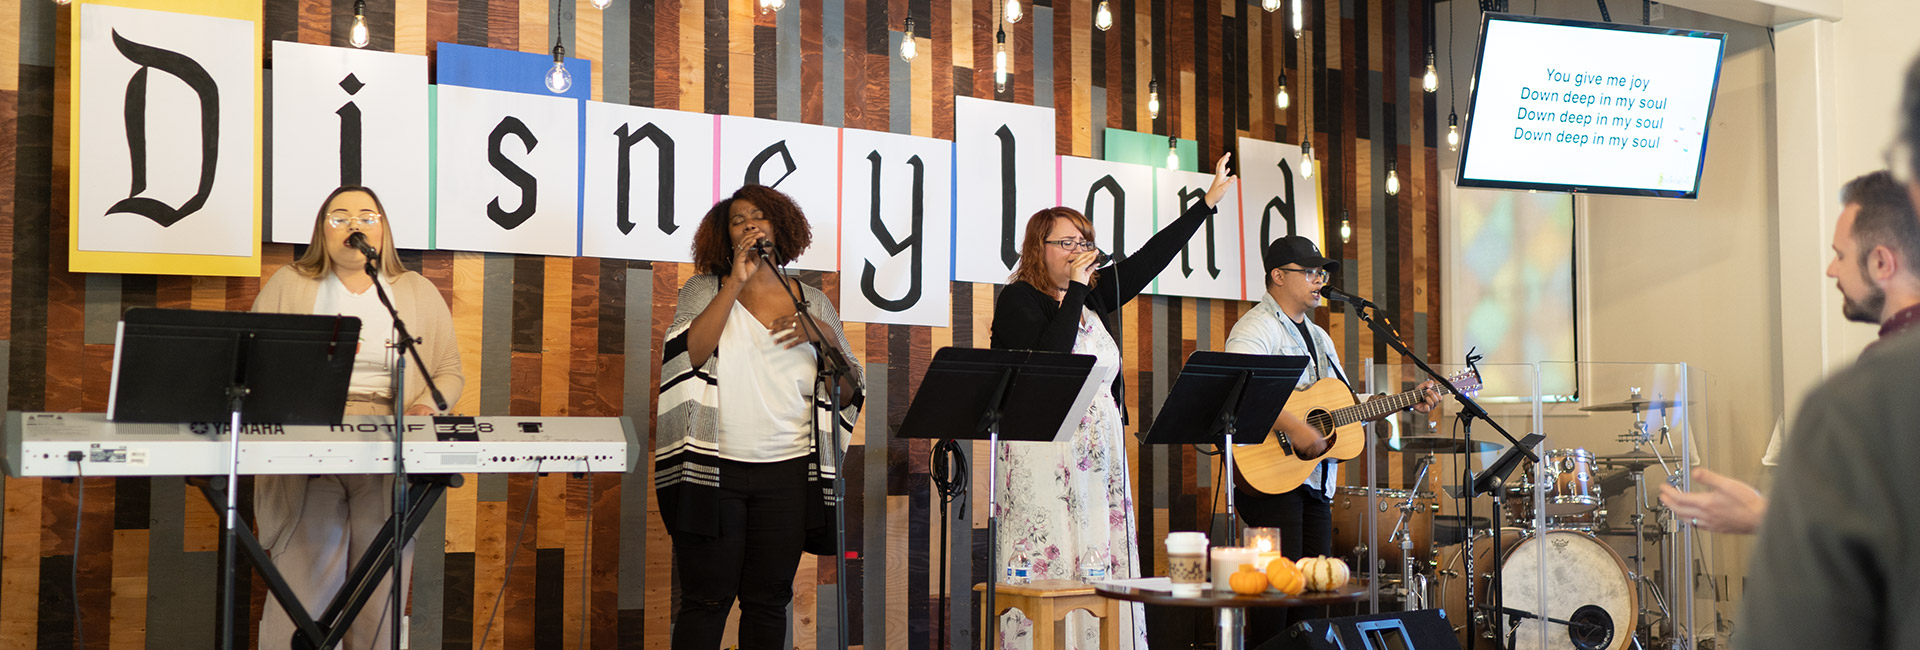 Worship team in Ventura leading Church to praise Jesus